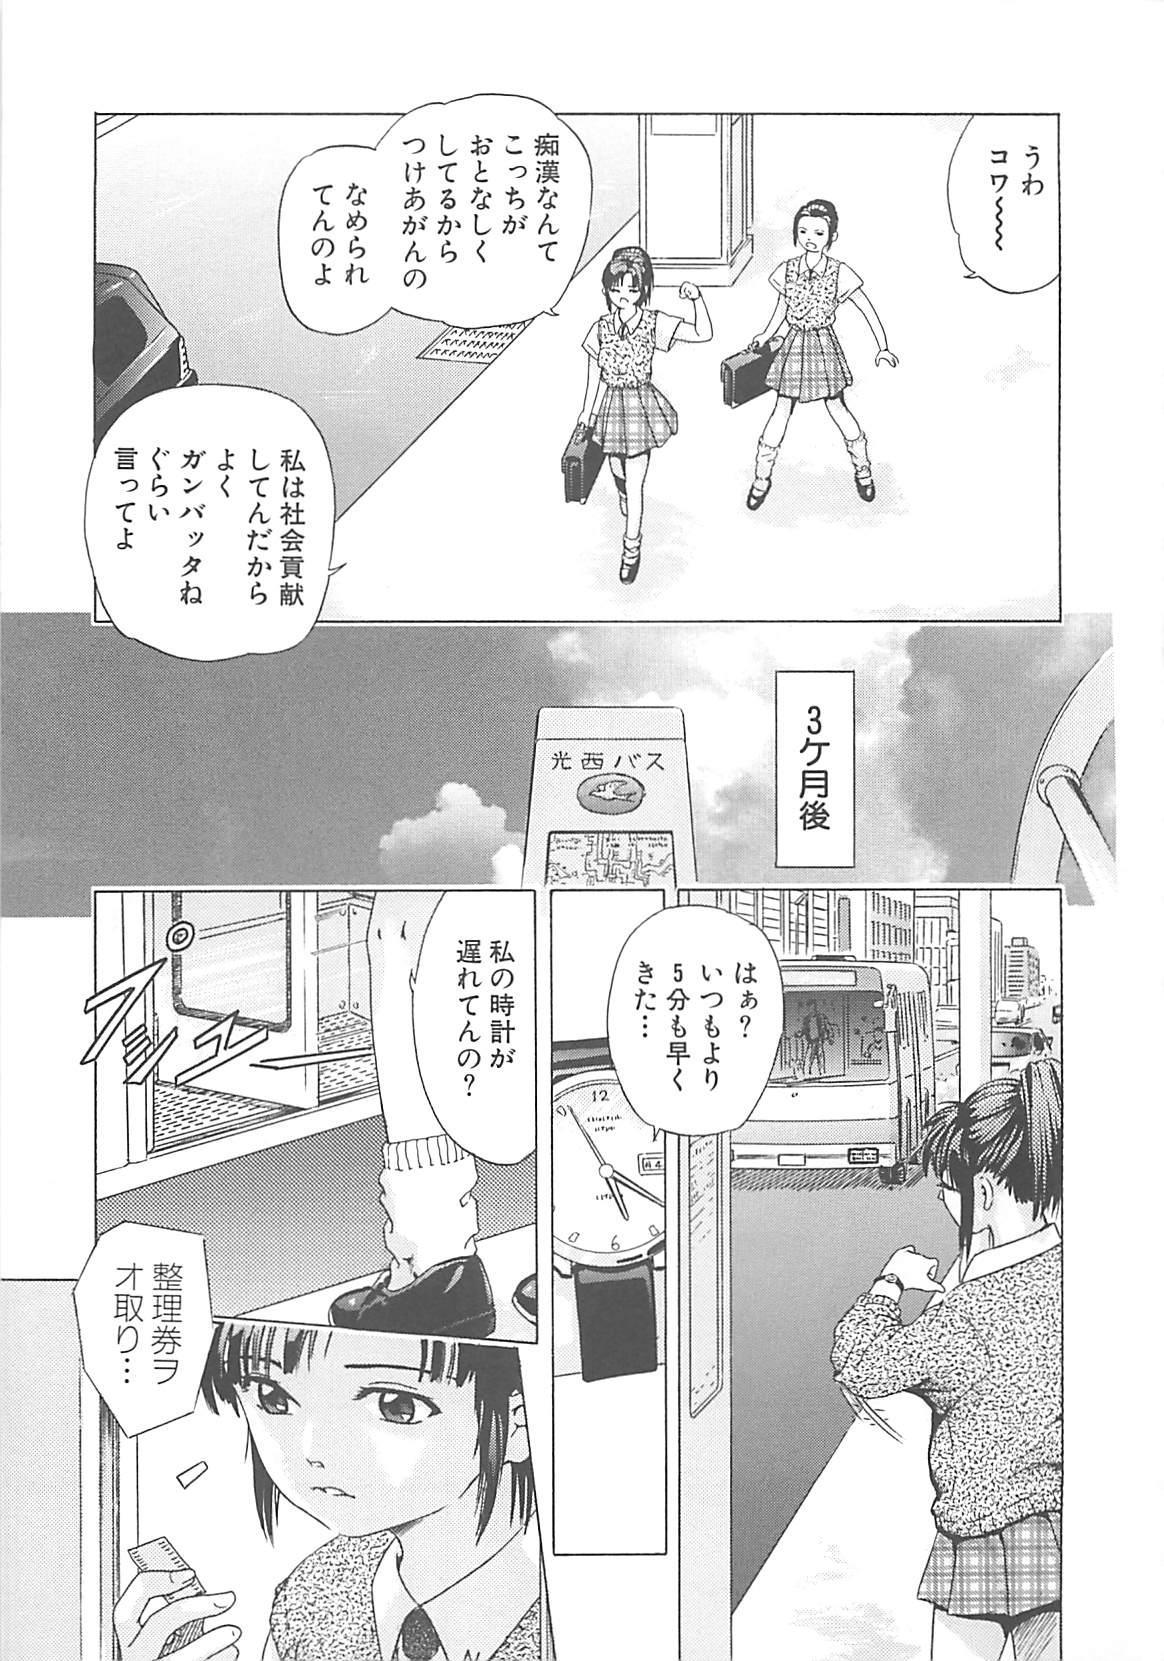 Kanin Kyoushitsu - Adultery Classroom 85